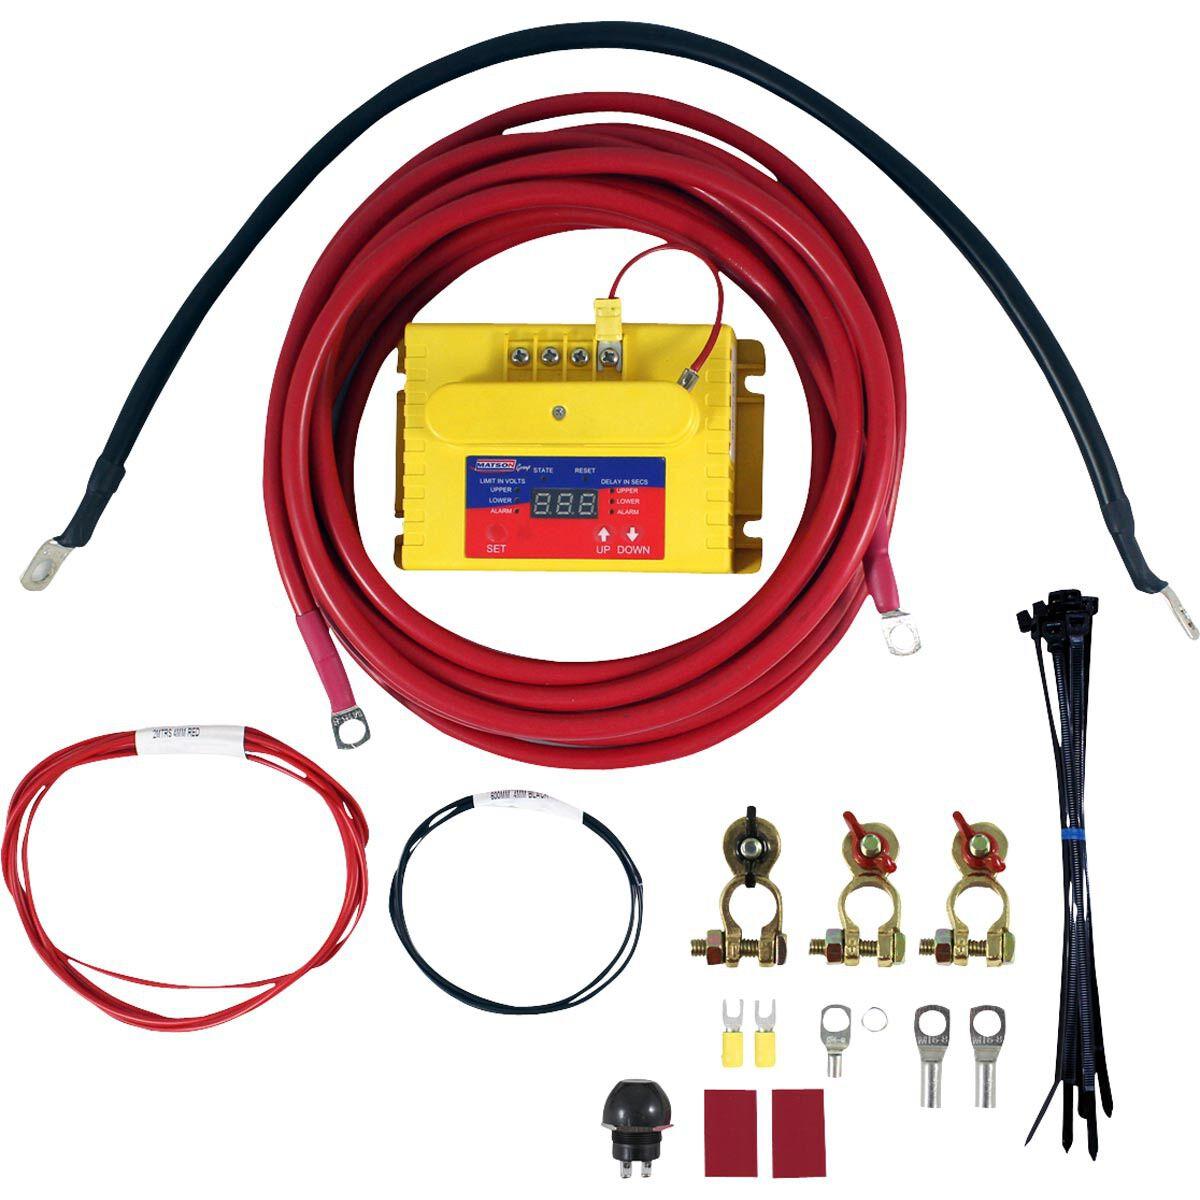 Matson Dual Battery Isolator Wiring Diagram Wire Data Schema Jvc Harness Likewise Kits Supercheap Auto Rh Supercheapauto Com Au Two Ranger